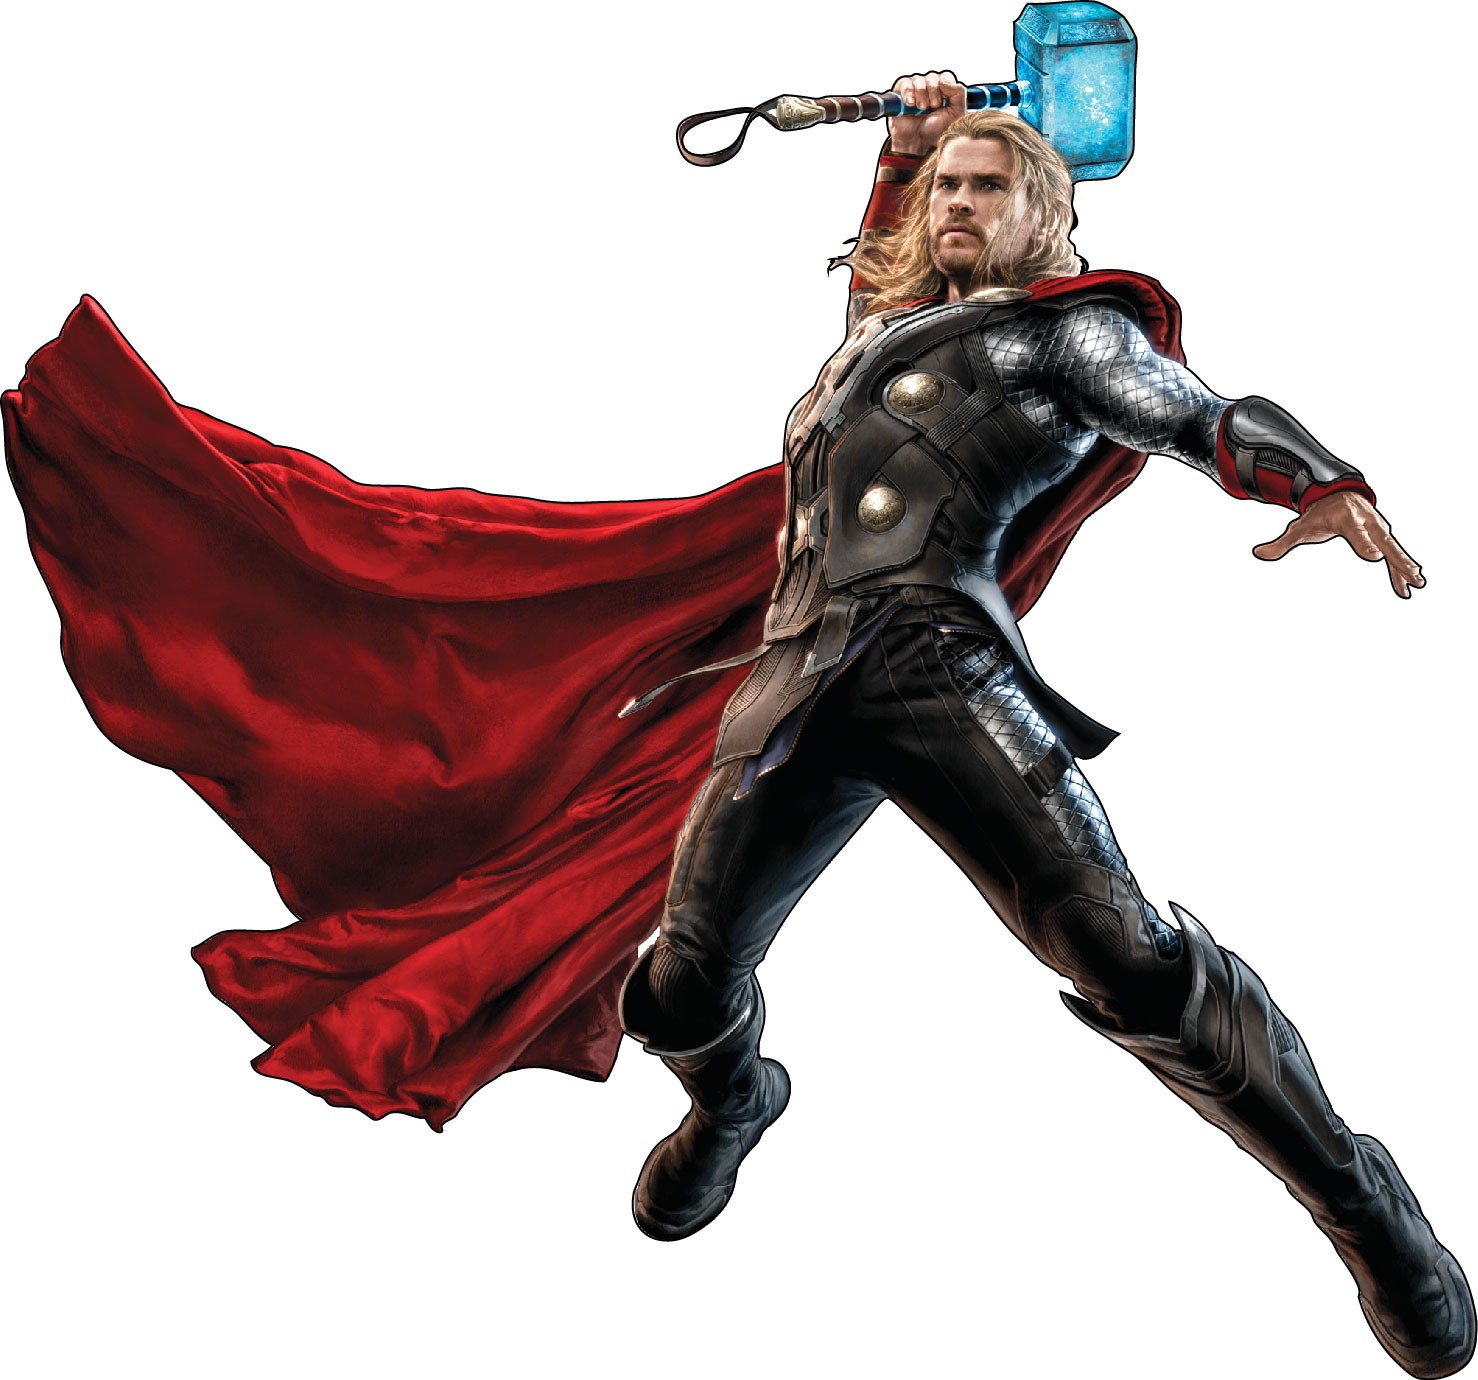 Stickers Enfant Thor Avengers Ref 15024 Stickers Muraux Enfant